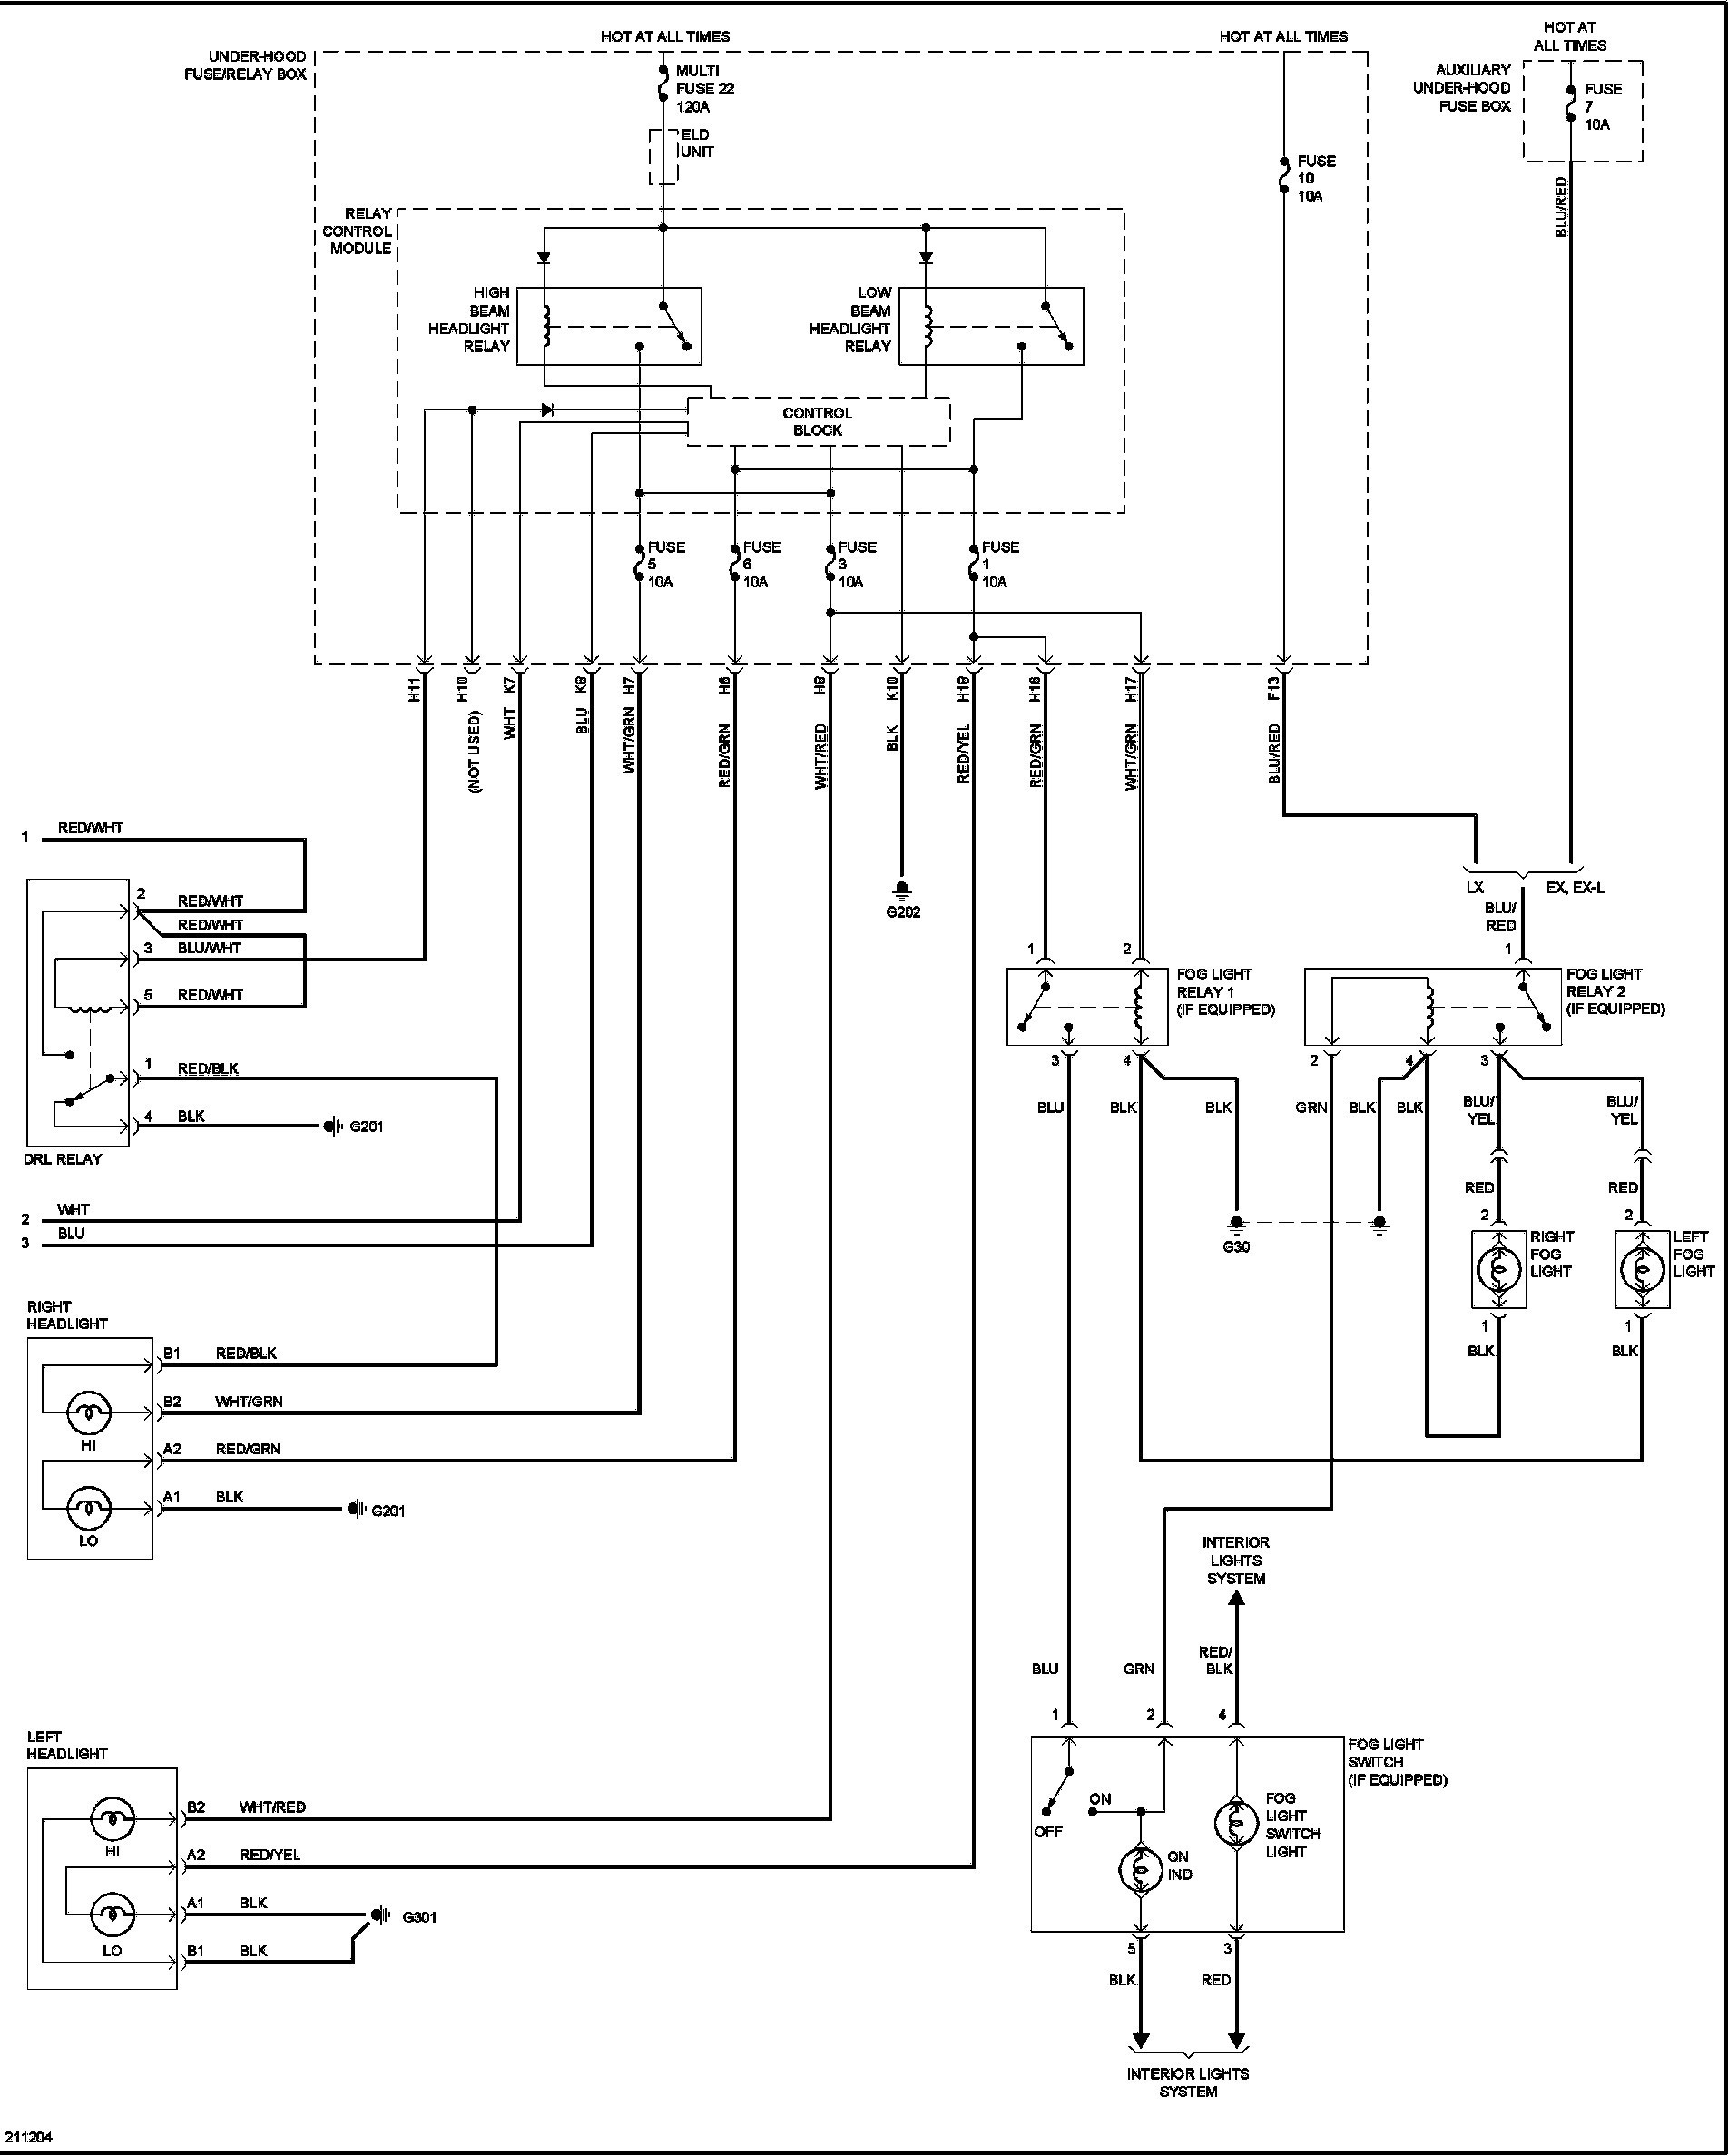 Honda Wiring Diagrams Cb 900 Diagram 1995 Odyssey Data Of